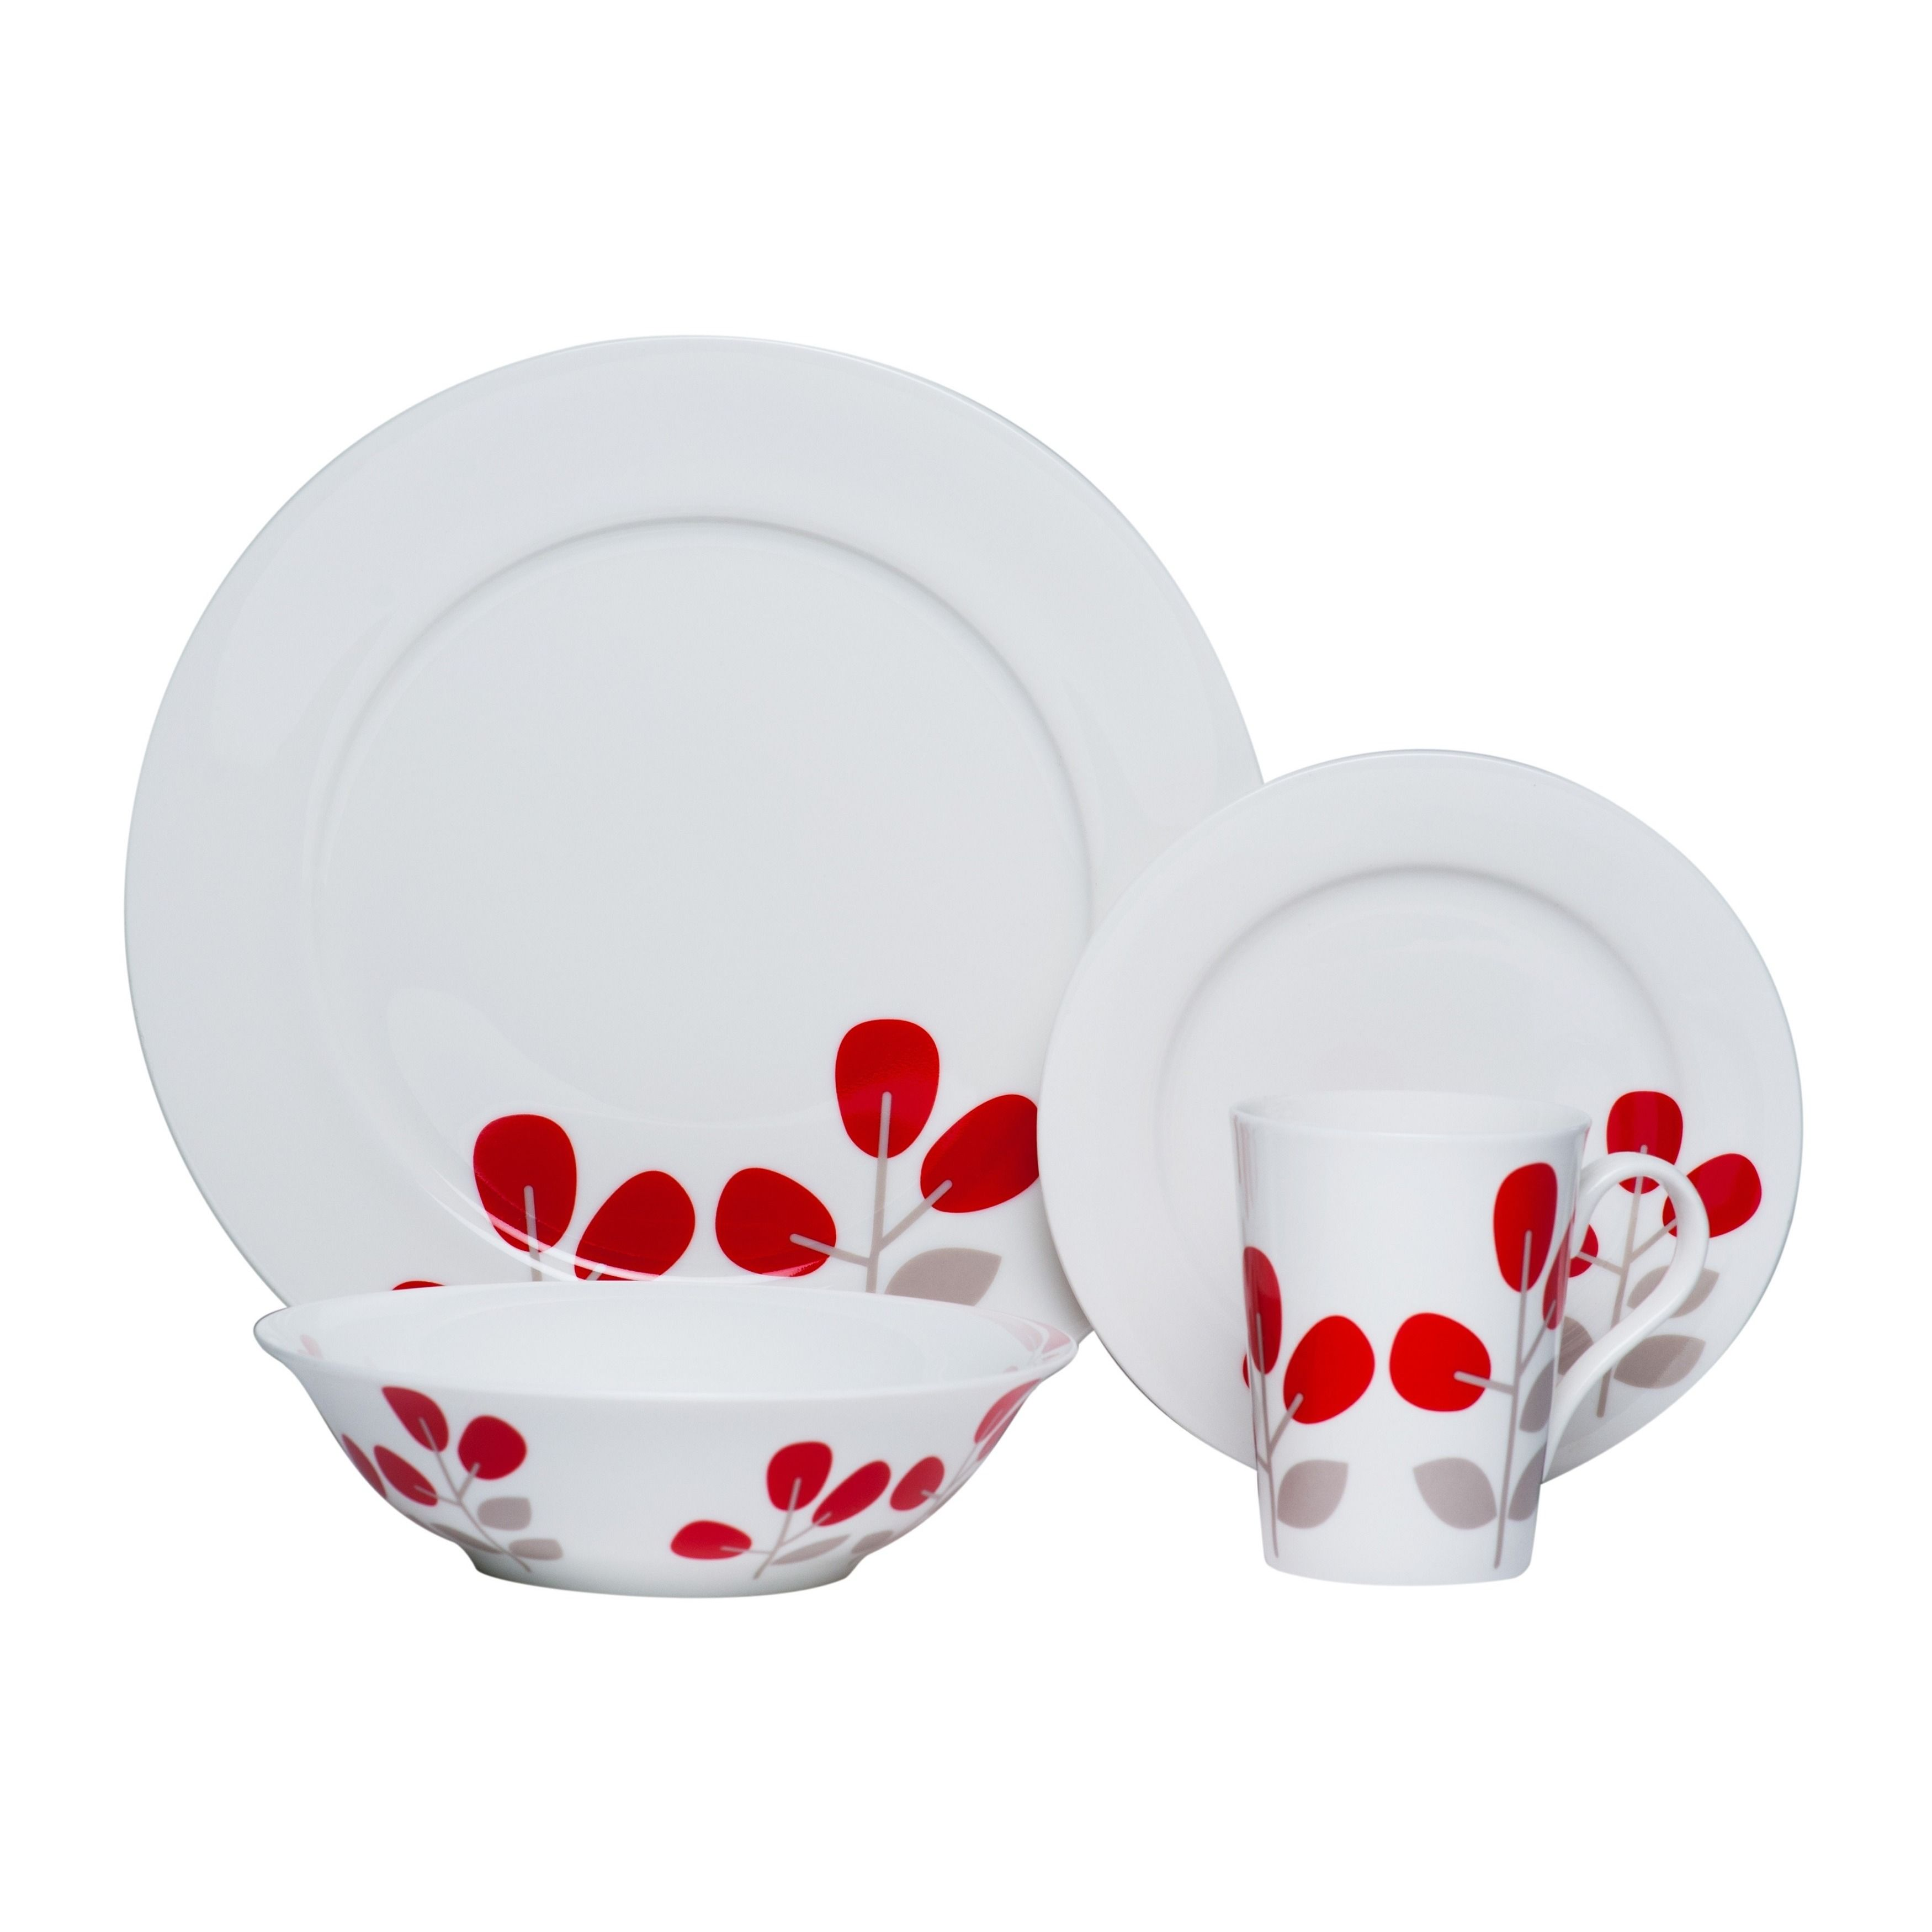 Red Vanilla Winterberry Red 16-piece Dinnerware Set (Red Vanilla Winterberry Red 16Pc Dinner Set) Grey (Bone China Floral) | Dinnerware Vanilla and ...  sc 1 st  Pinterest & Red Vanilla Winterberry Red 16-piece Dinnerware Set (Red Vanilla ...